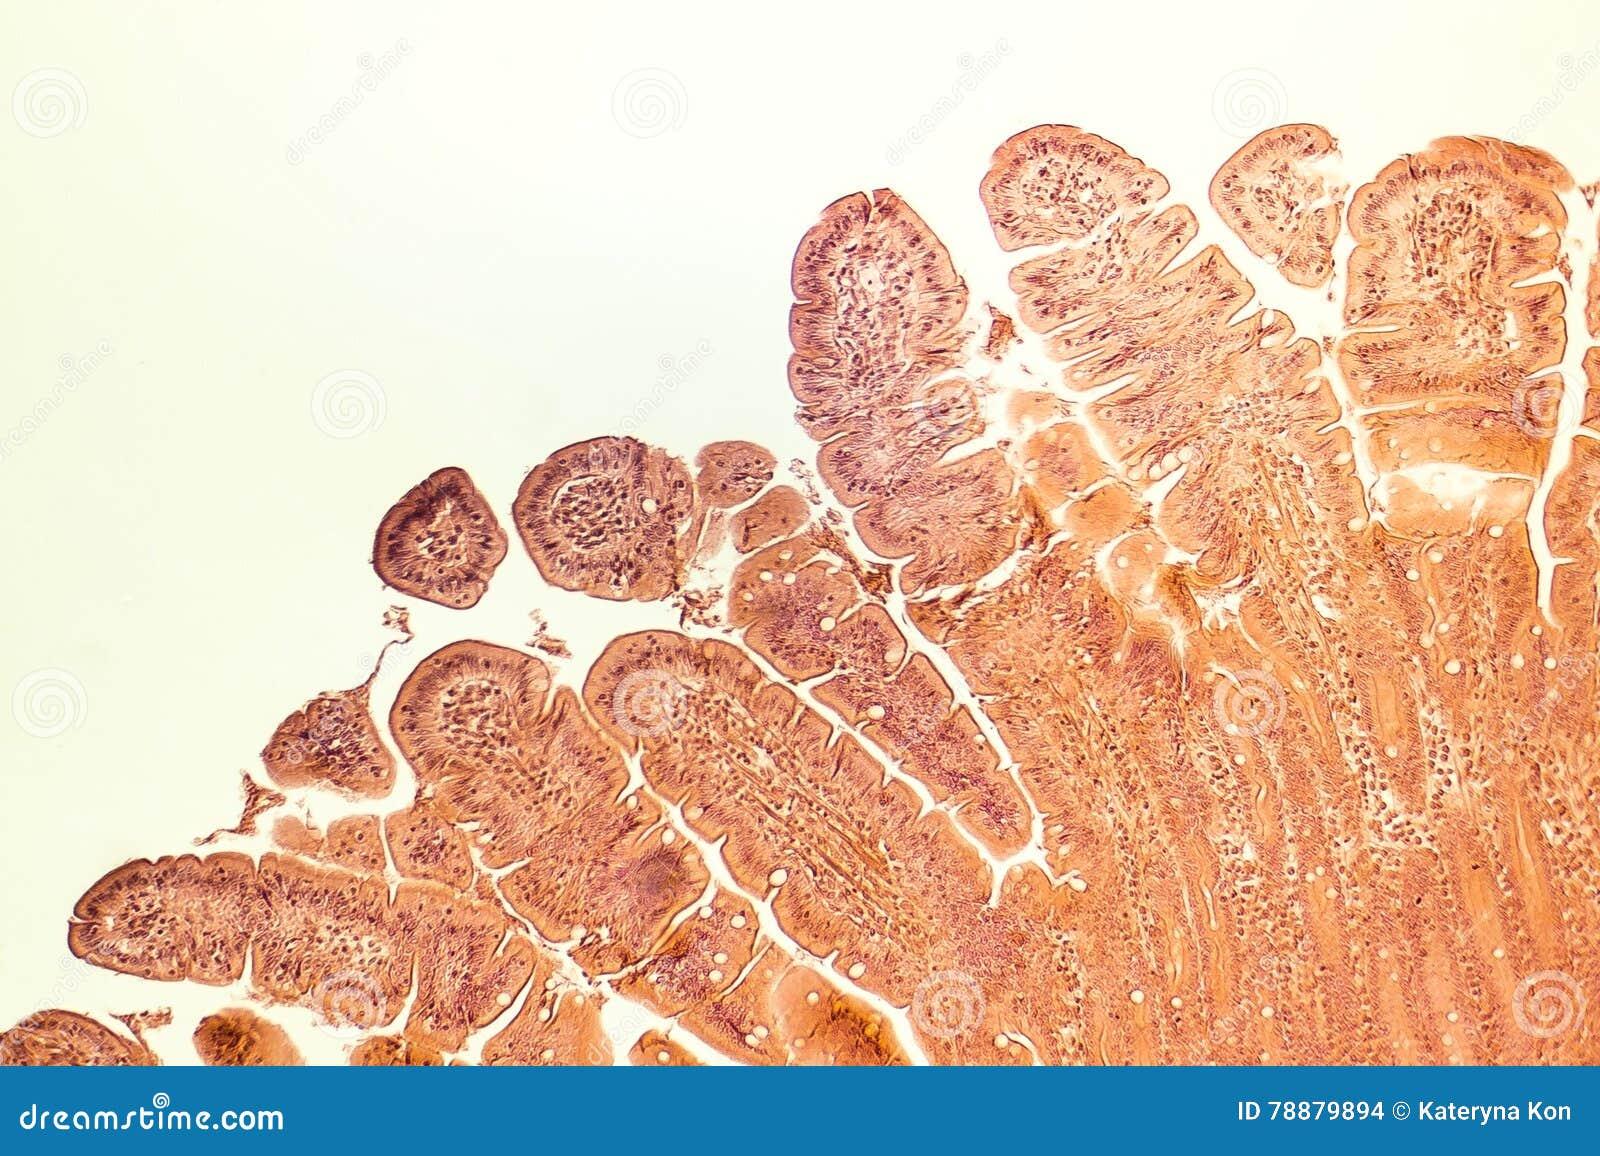 Vellosidades del intestino delgado